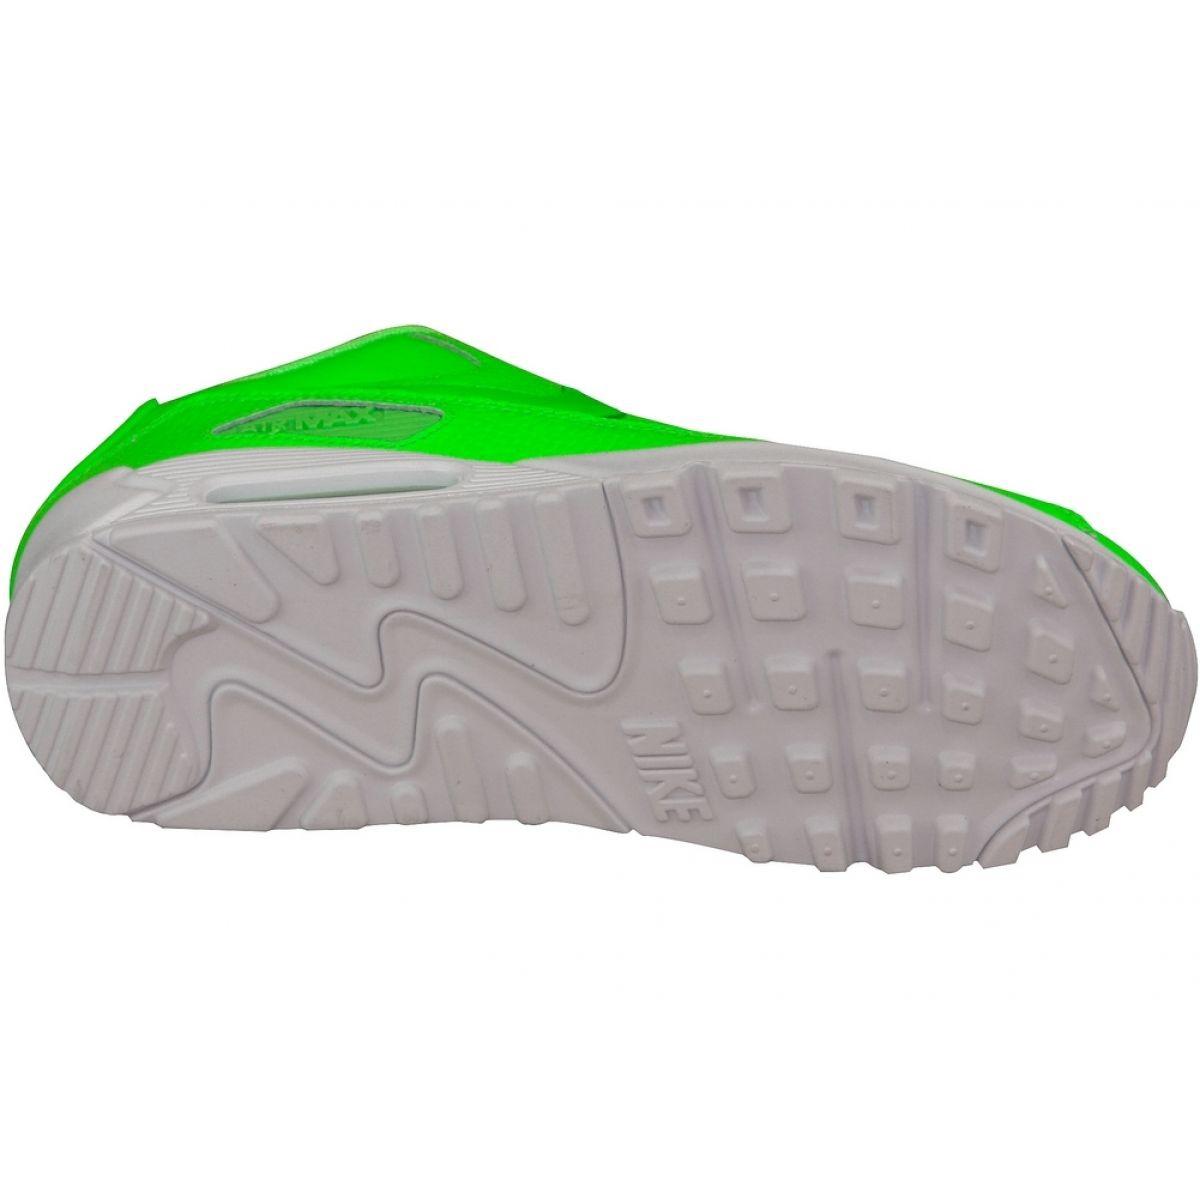 Buty Nike Air Max 90 Ltr Gs W 724821 300 zielone ButyModne.pl